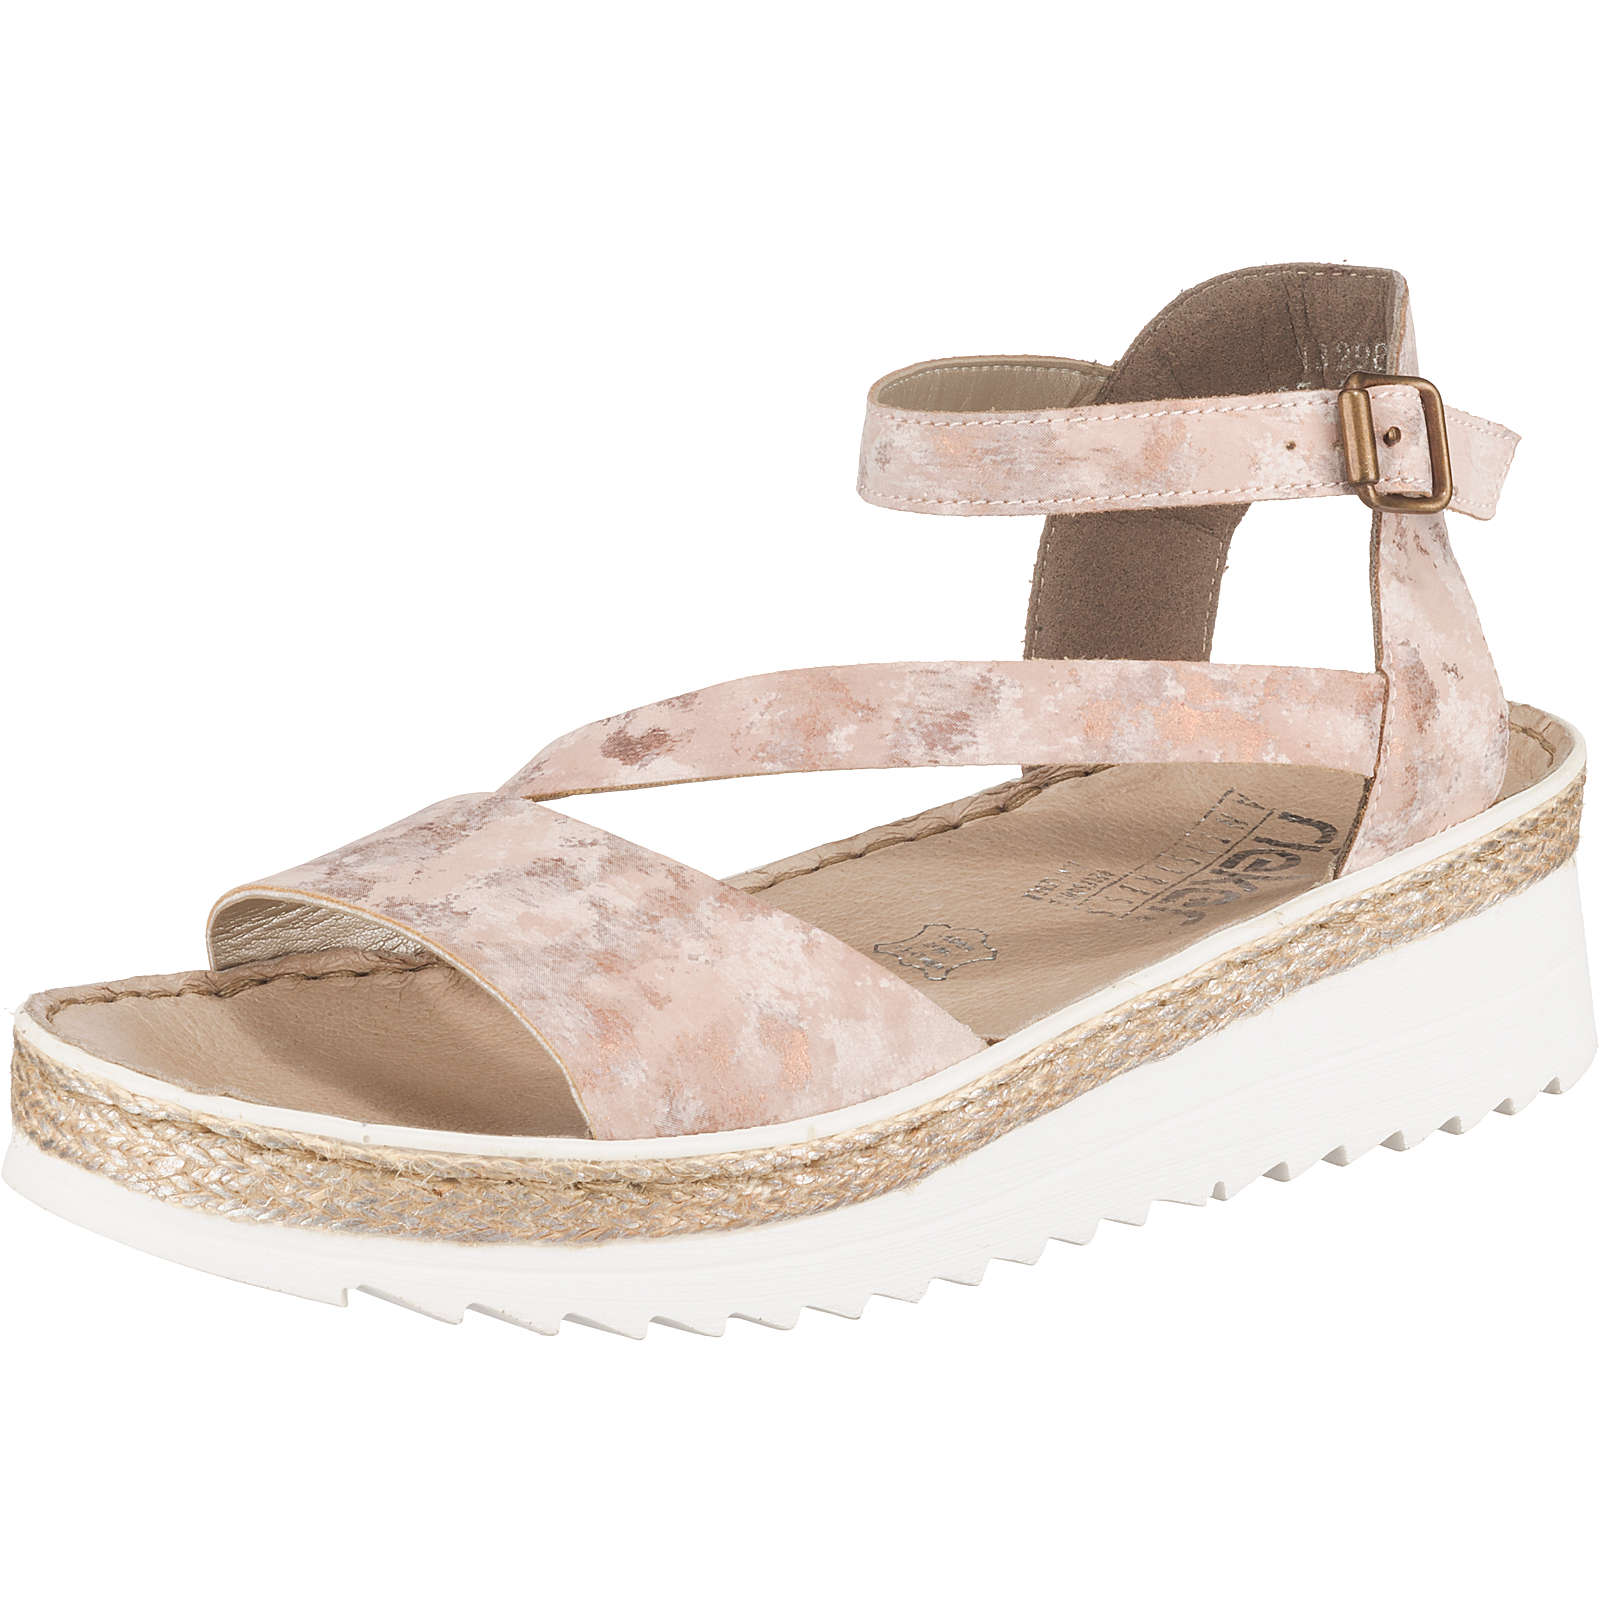 rieker Klassische Sandalen rosa Damen Gr. 37